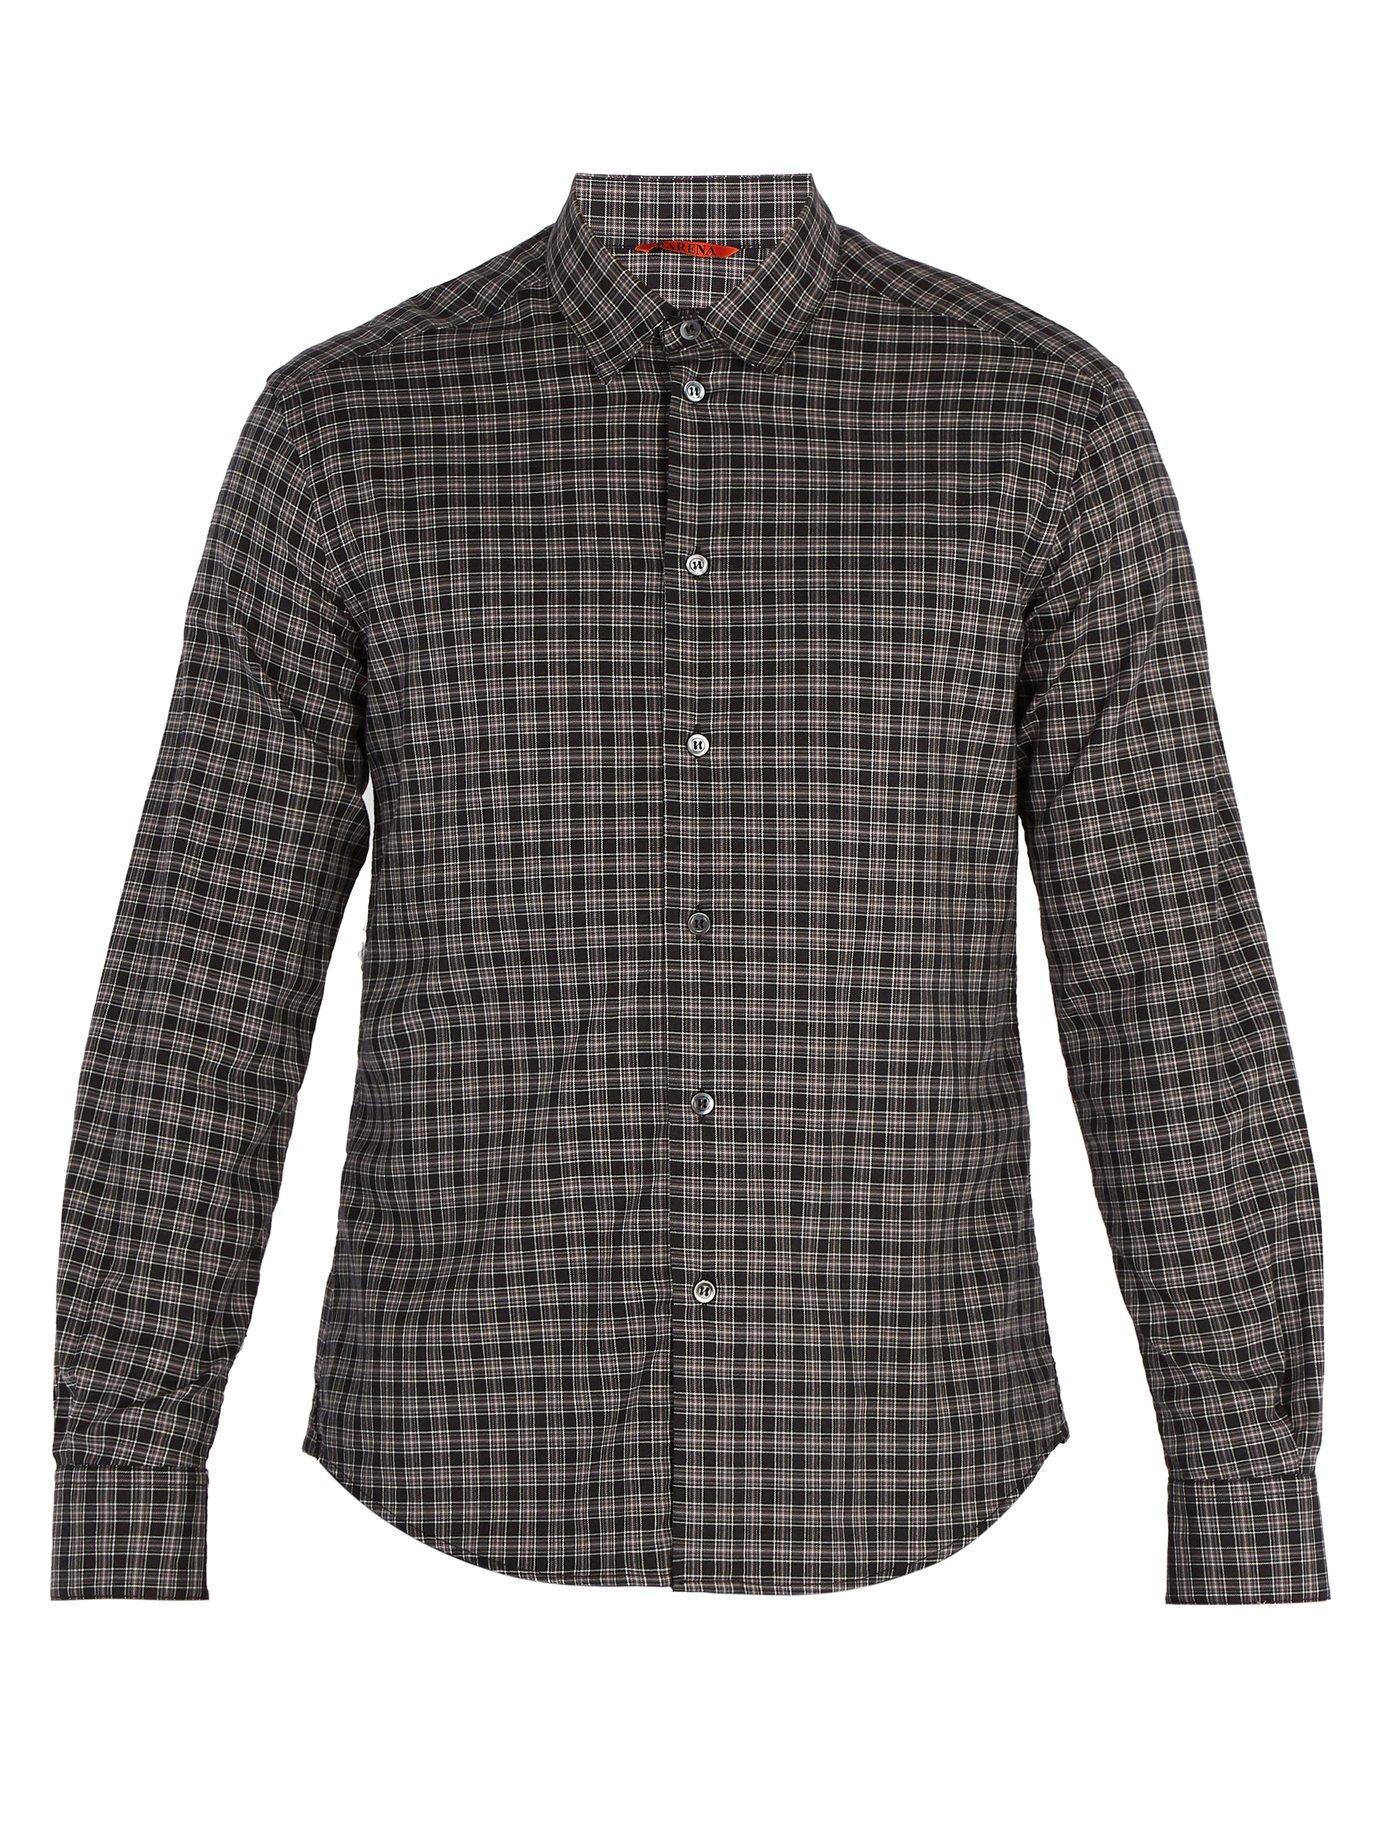 Barena Venezia Point-Collar Checked Cotton Shirt In Black